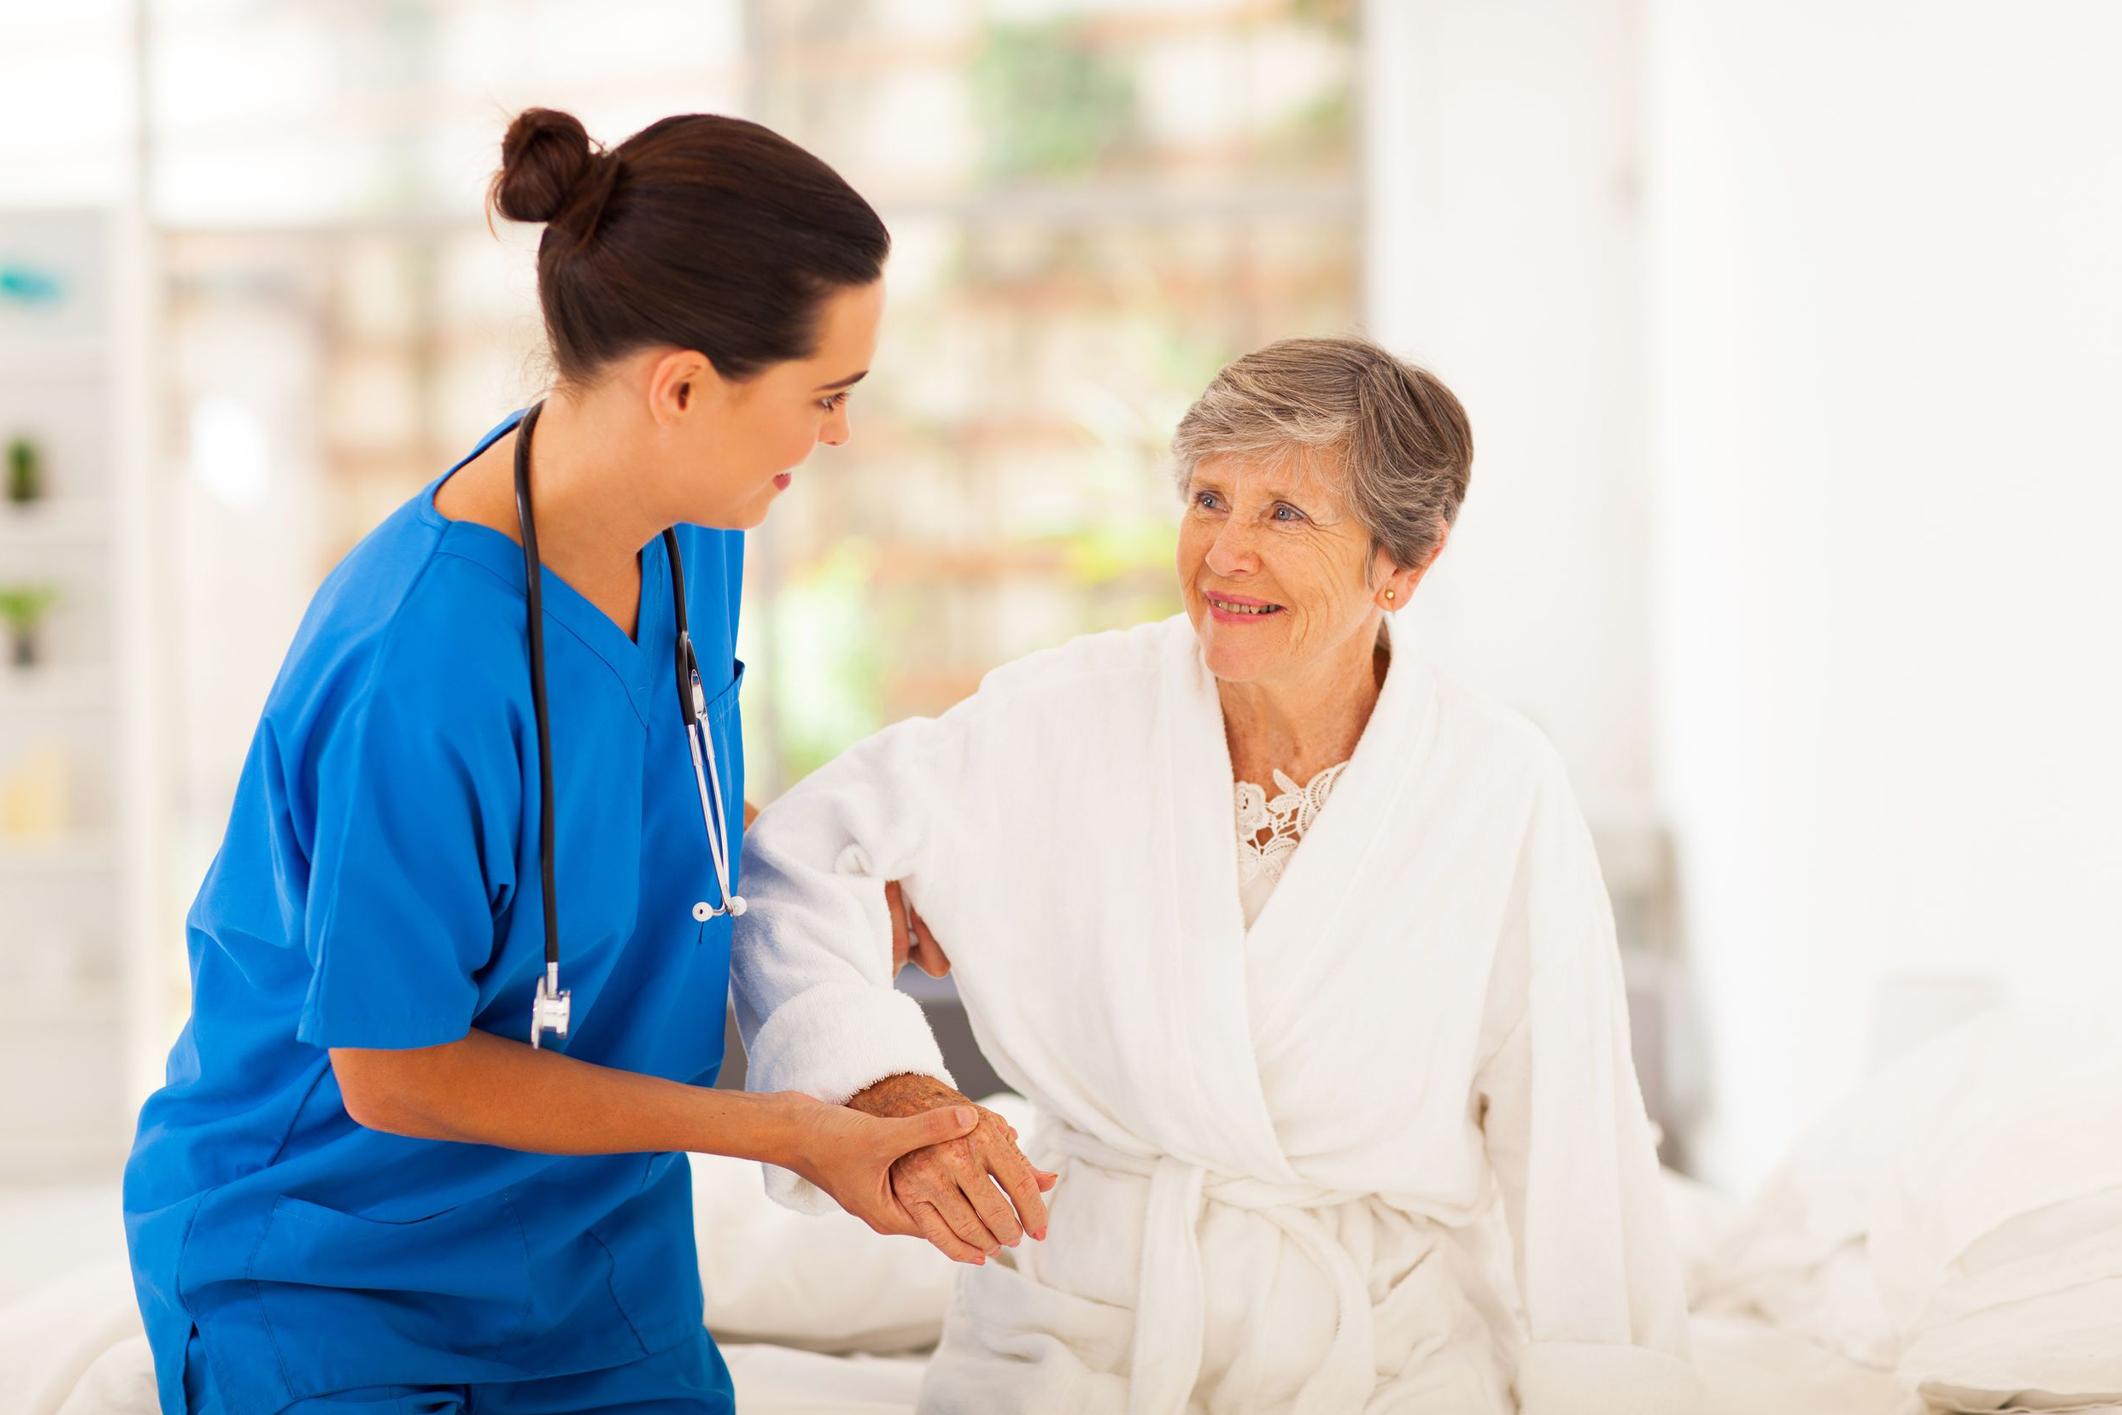 نقش پرستار سالمند